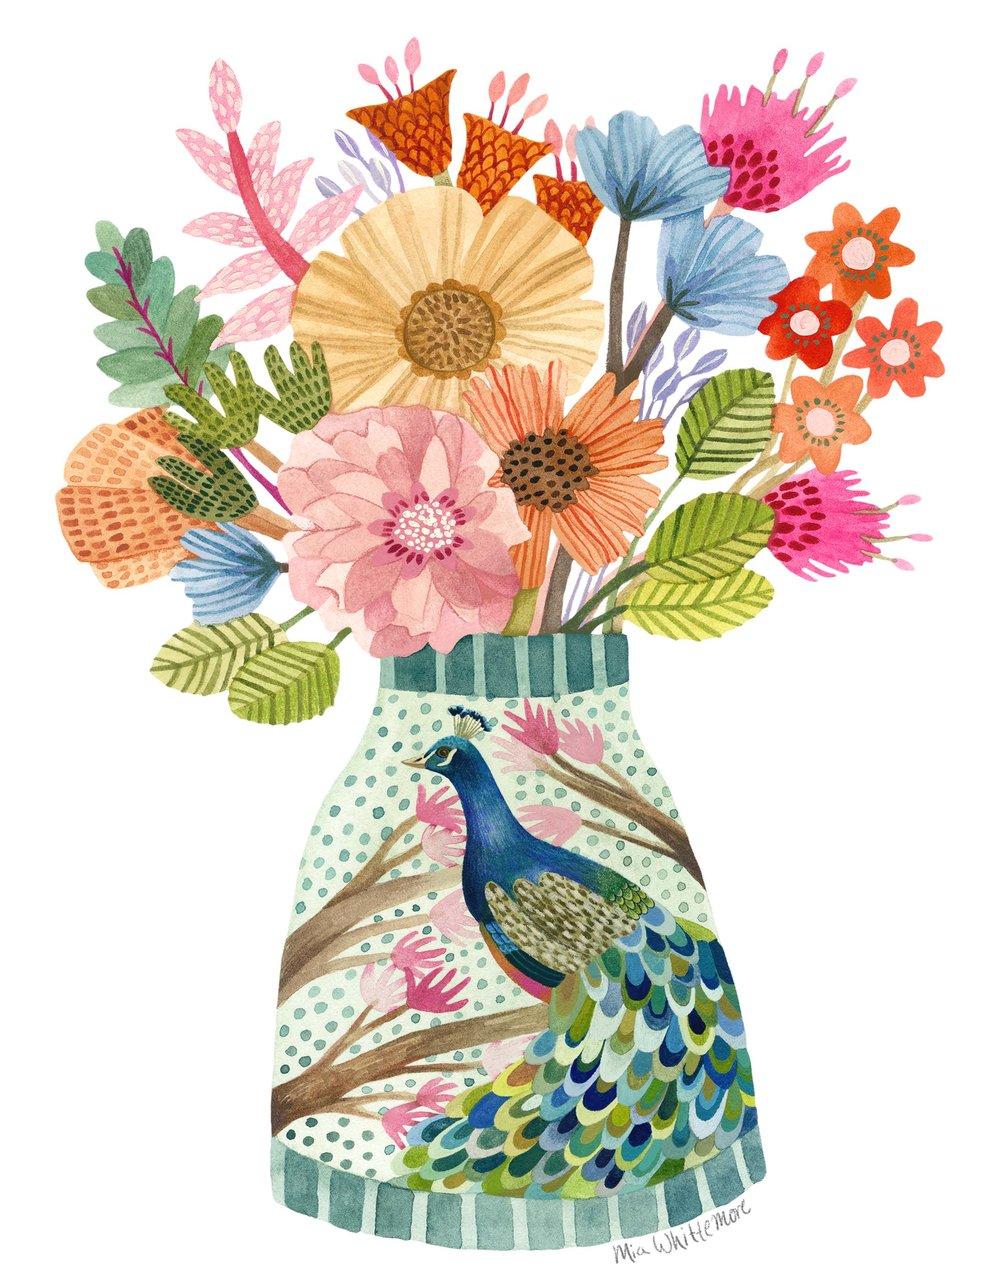 Mia Whittemore_Peacock Vase.jpg